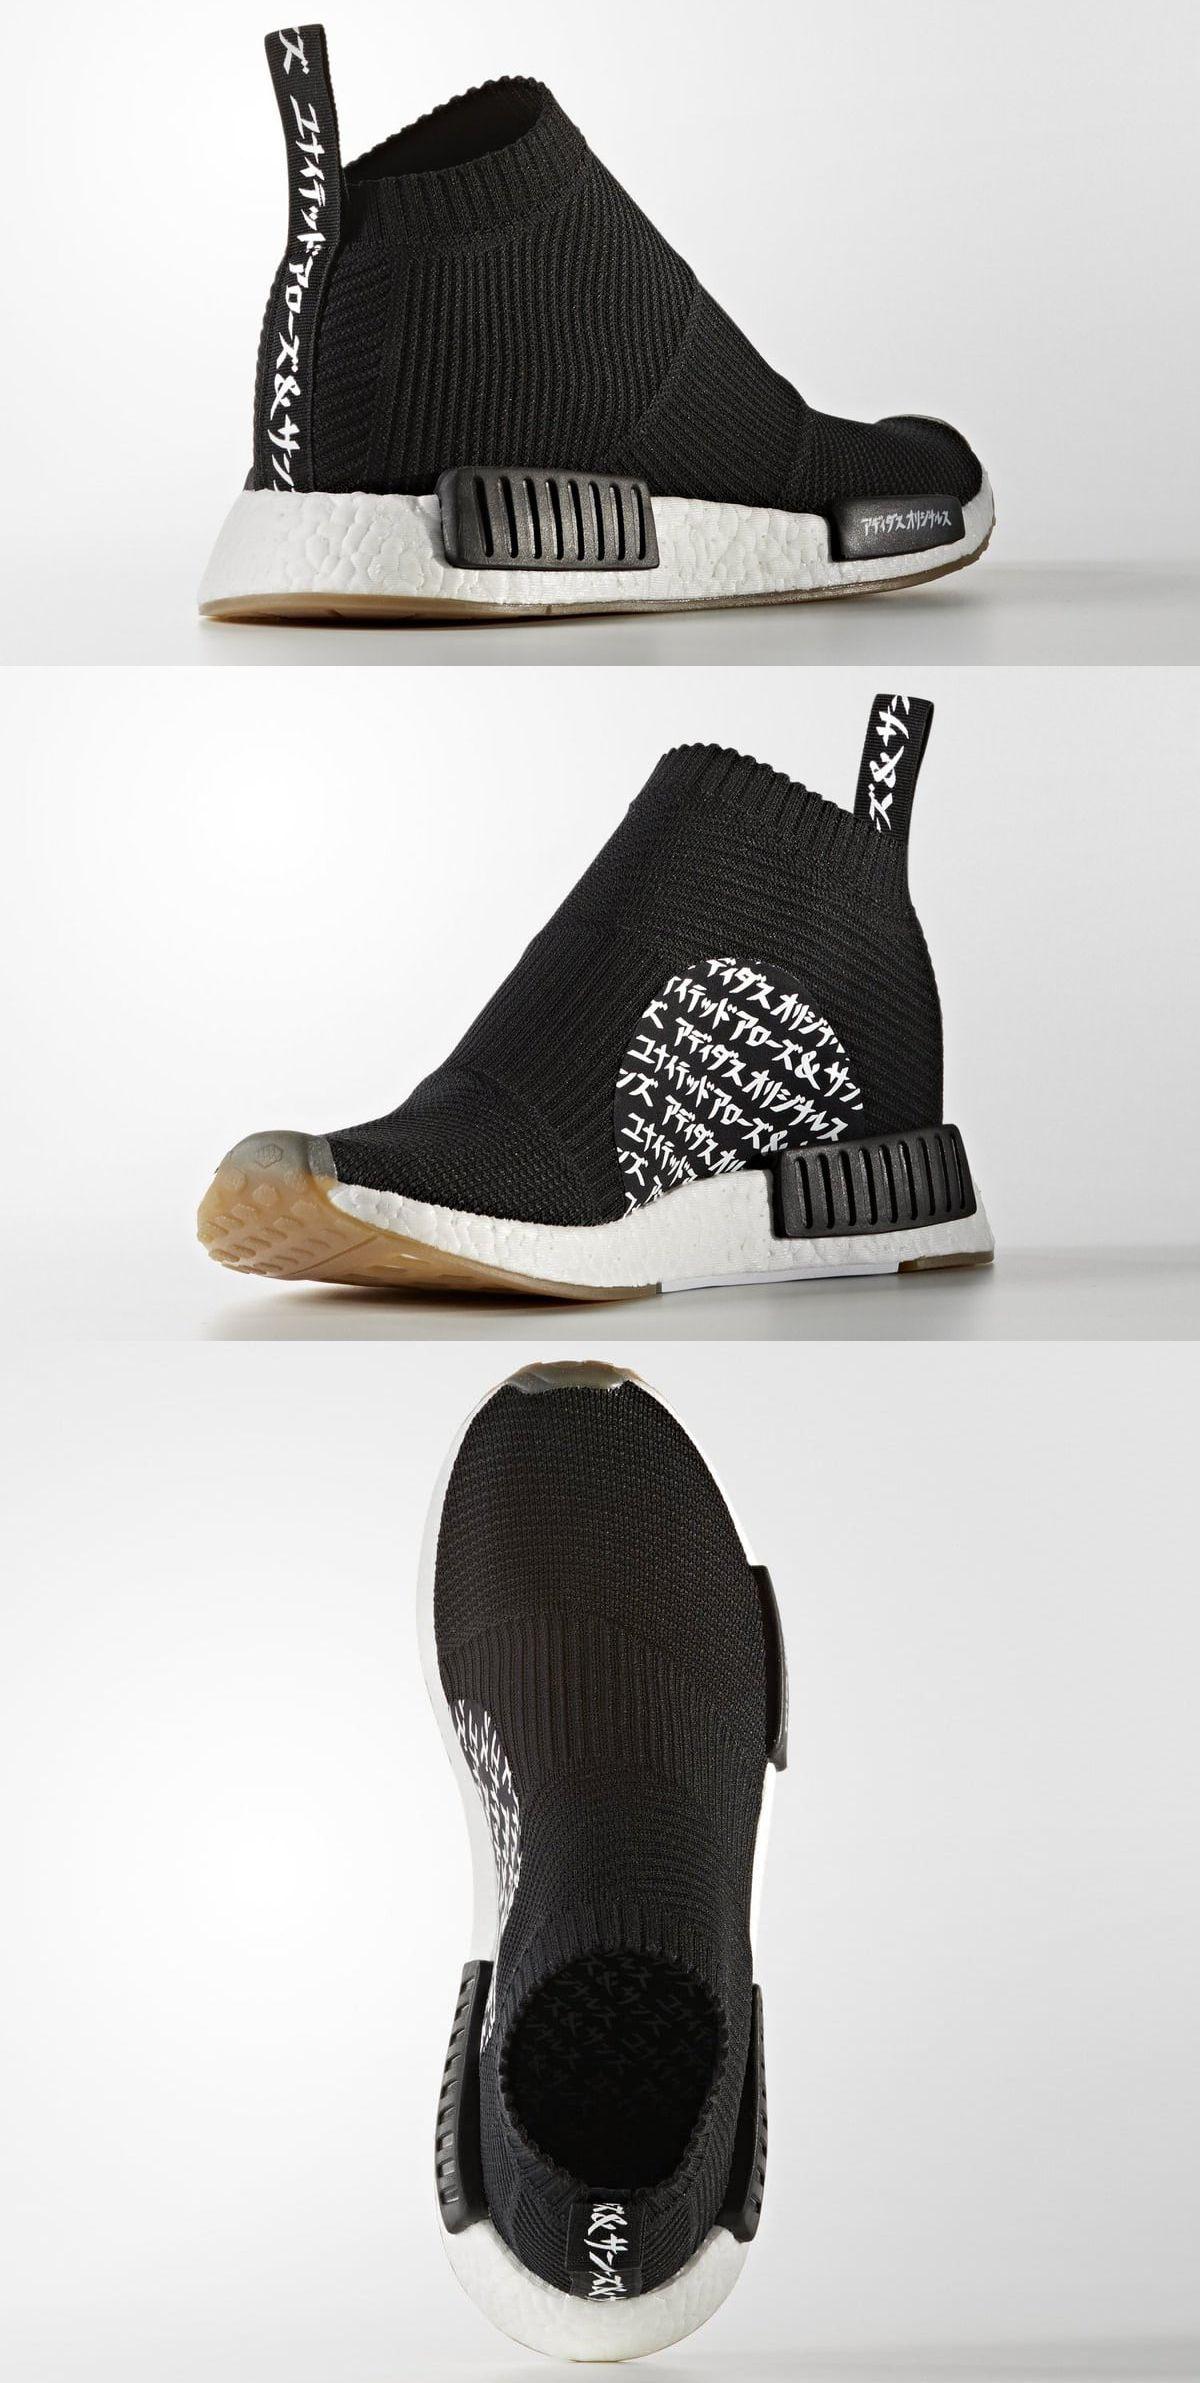 United Arrows & Sons x Adidas NMD ciudad Sock patadas Pinterest